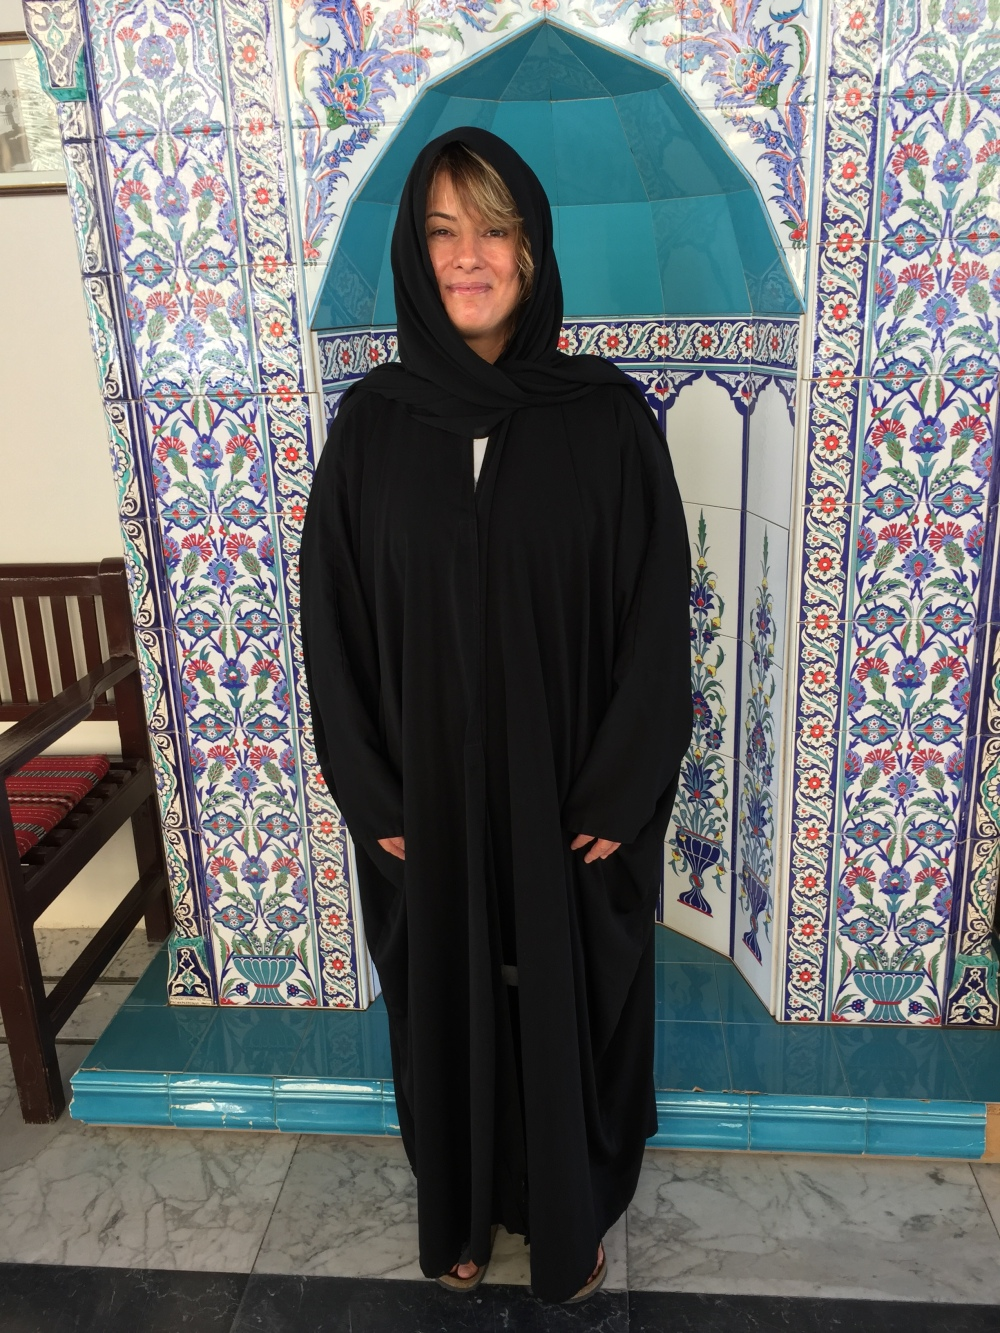 Grand Mosque of Kuwait - Kuwait City, Kuwait - Waiting area - Wearing the required abaya and shayla